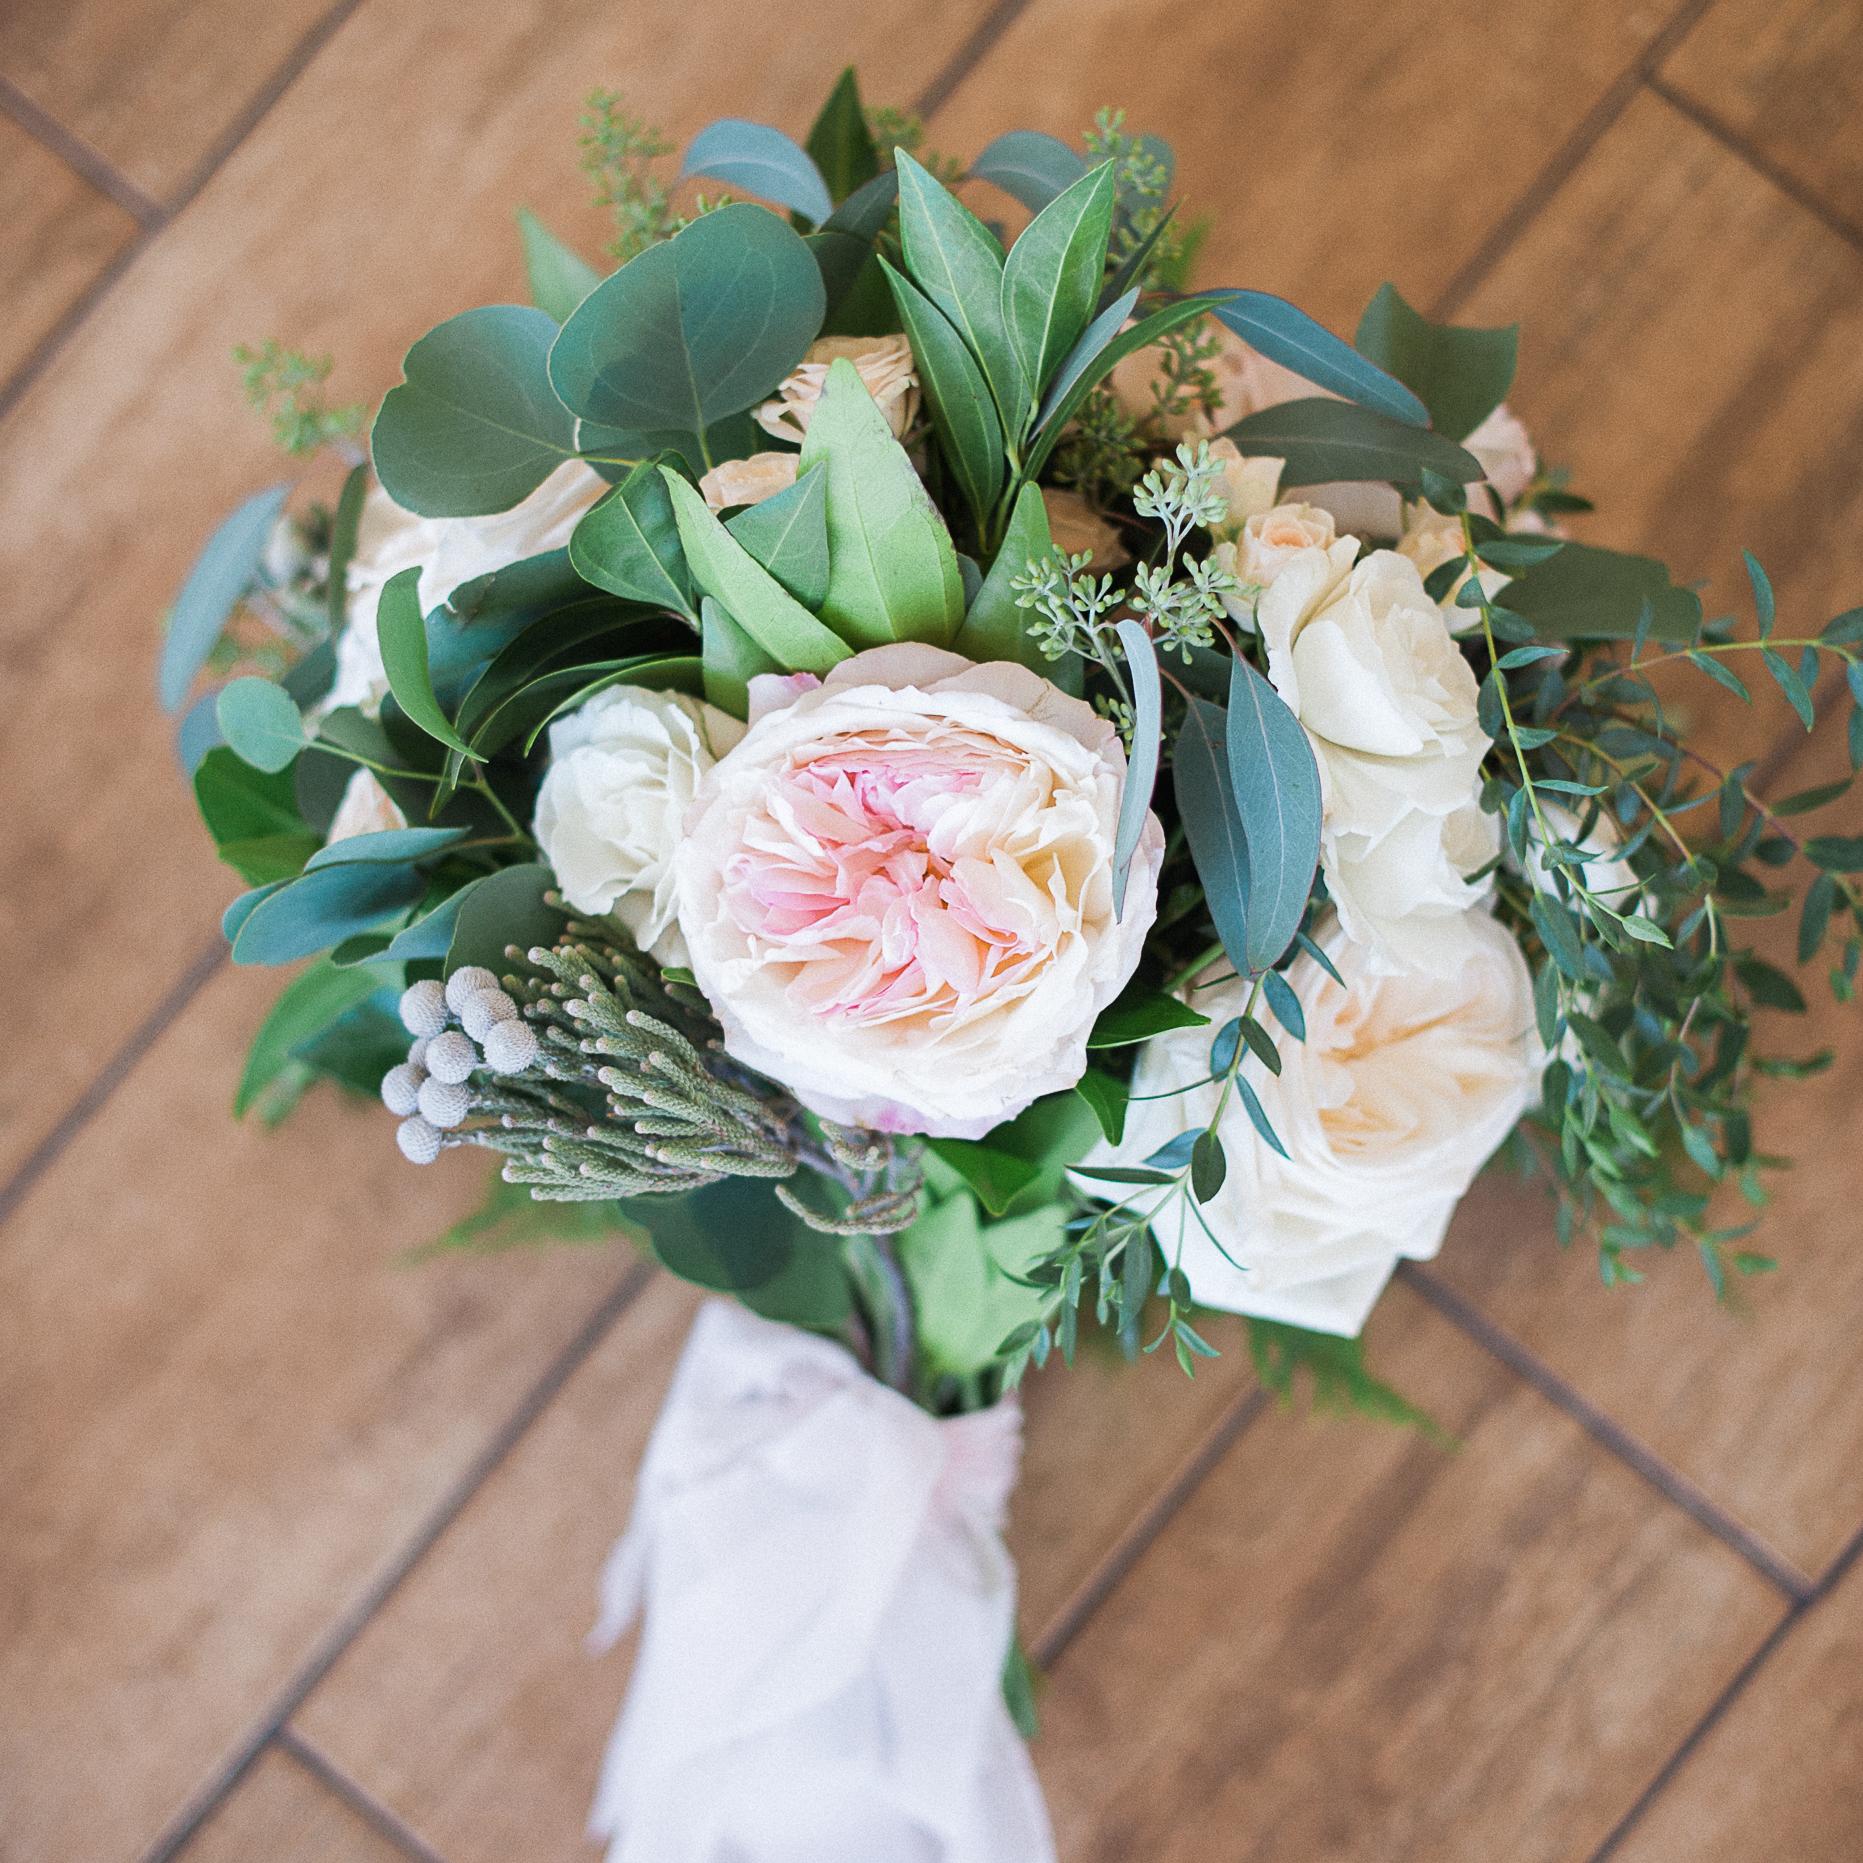 Carmel Mountain Ranch Country Club Blush & ivory, garden rose romantic bridal bouquet by San Diego wedding florist, Compass Floral.  Brandi Welles Photography.